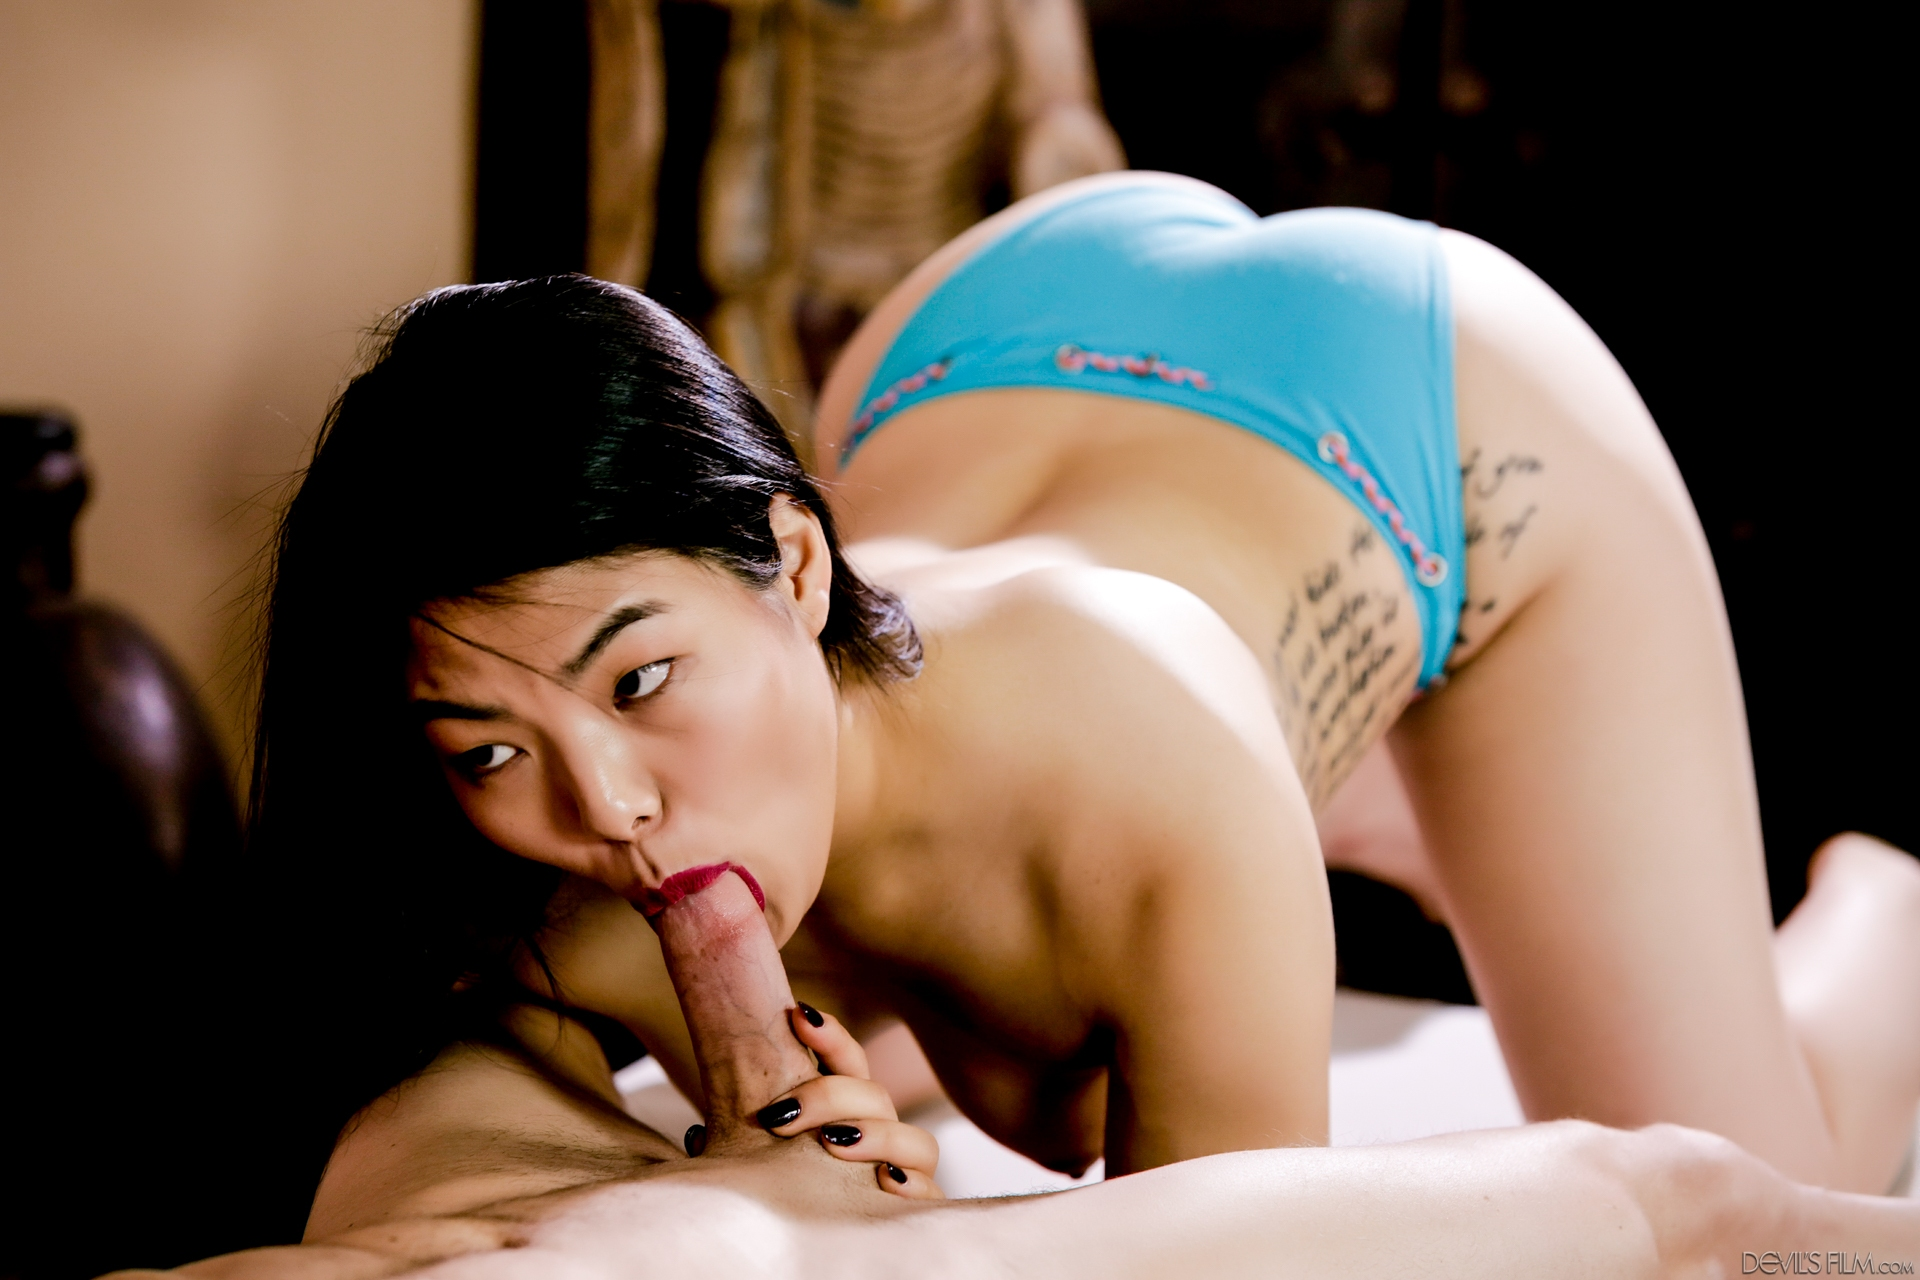 Порно азиаточки стрип, трахаются в презервативе фото